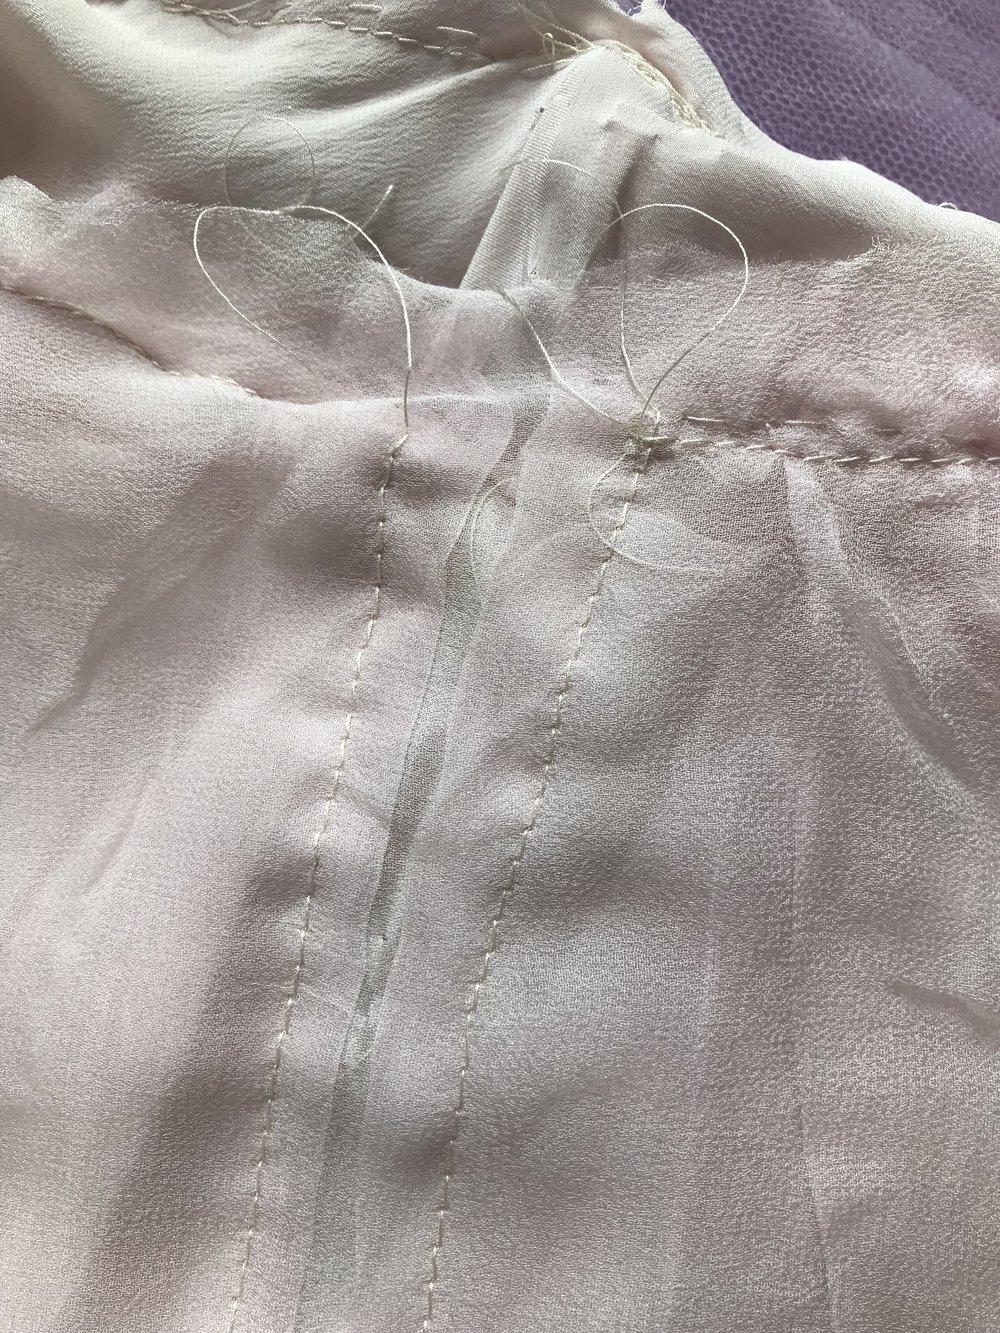 basting wedding dress for zipper